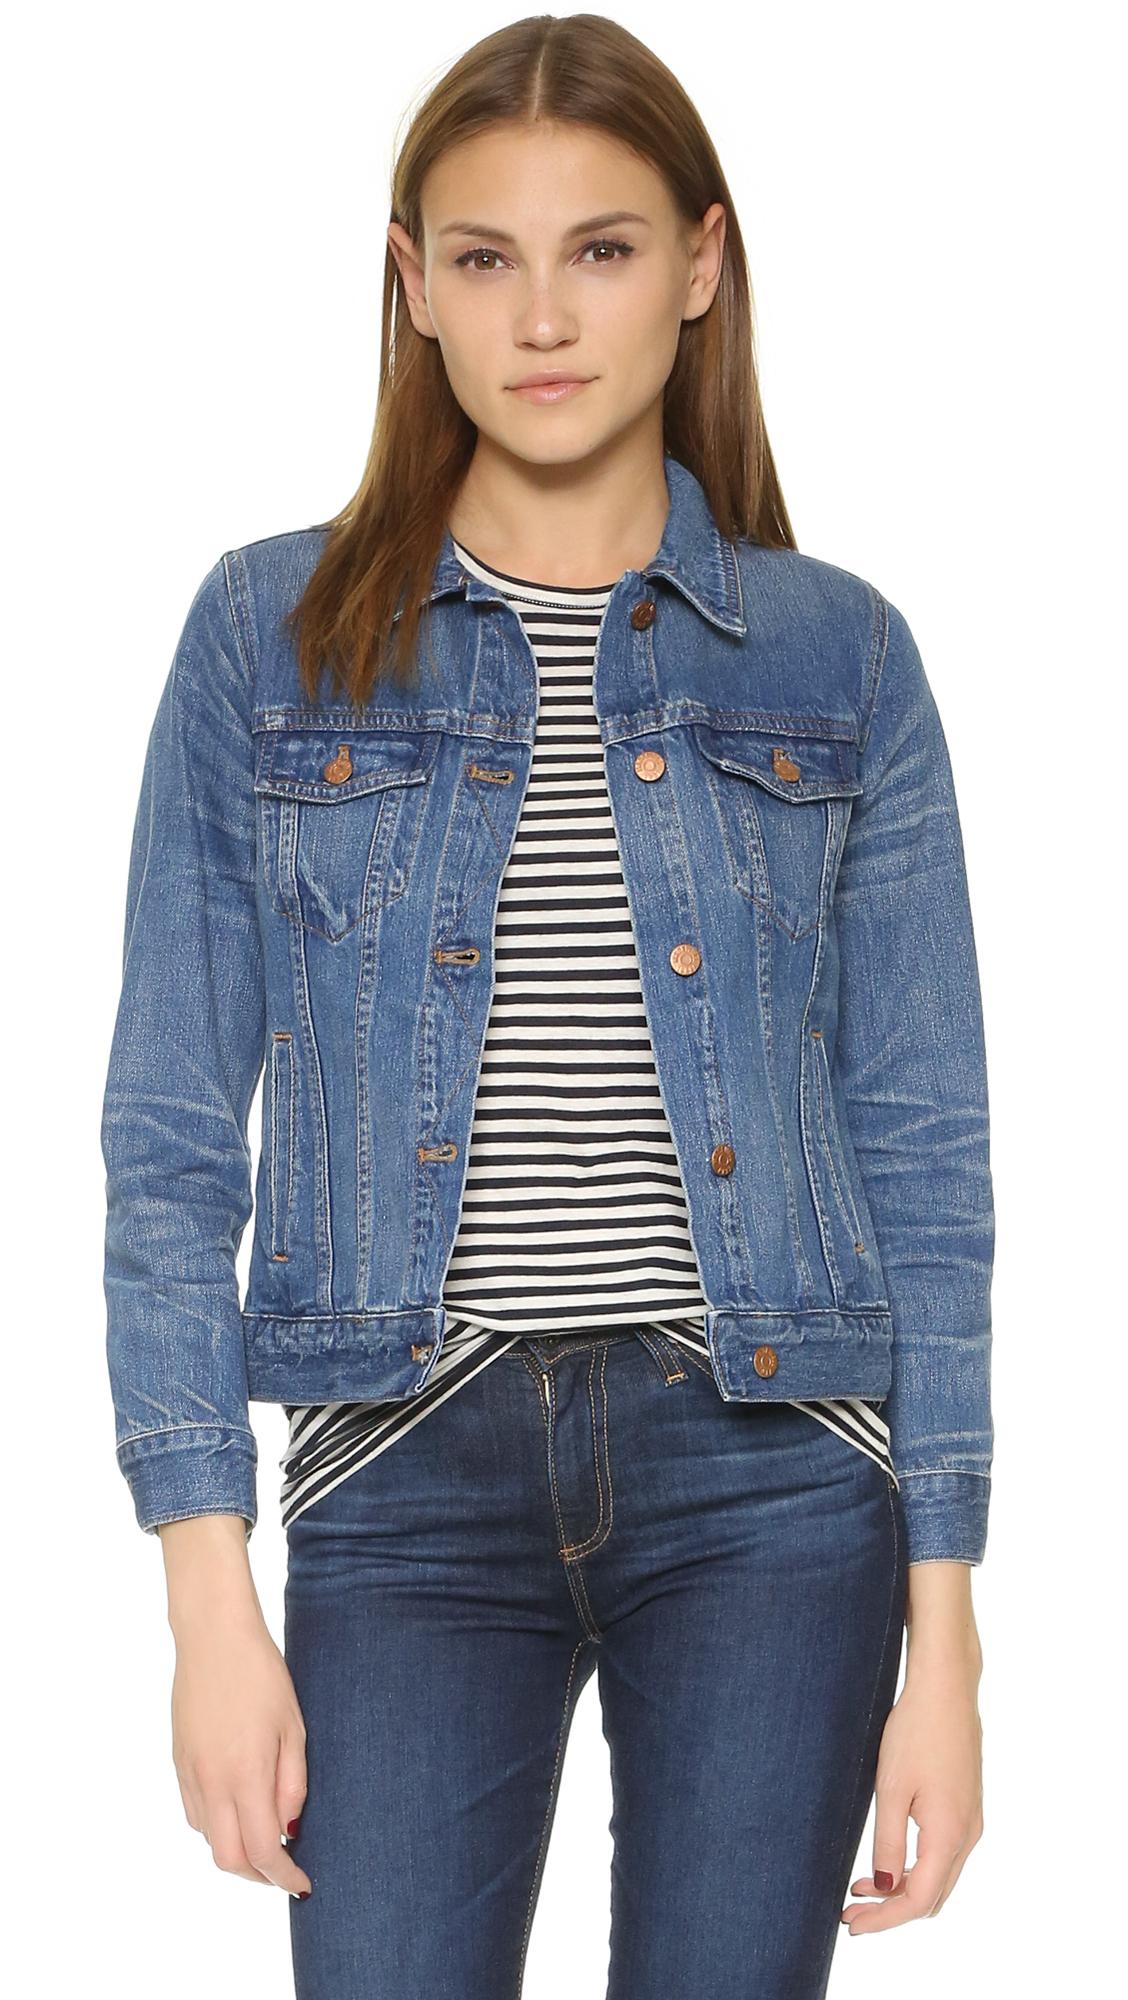 Madewell Denim Jacket in Blue | Lyst - photo#4